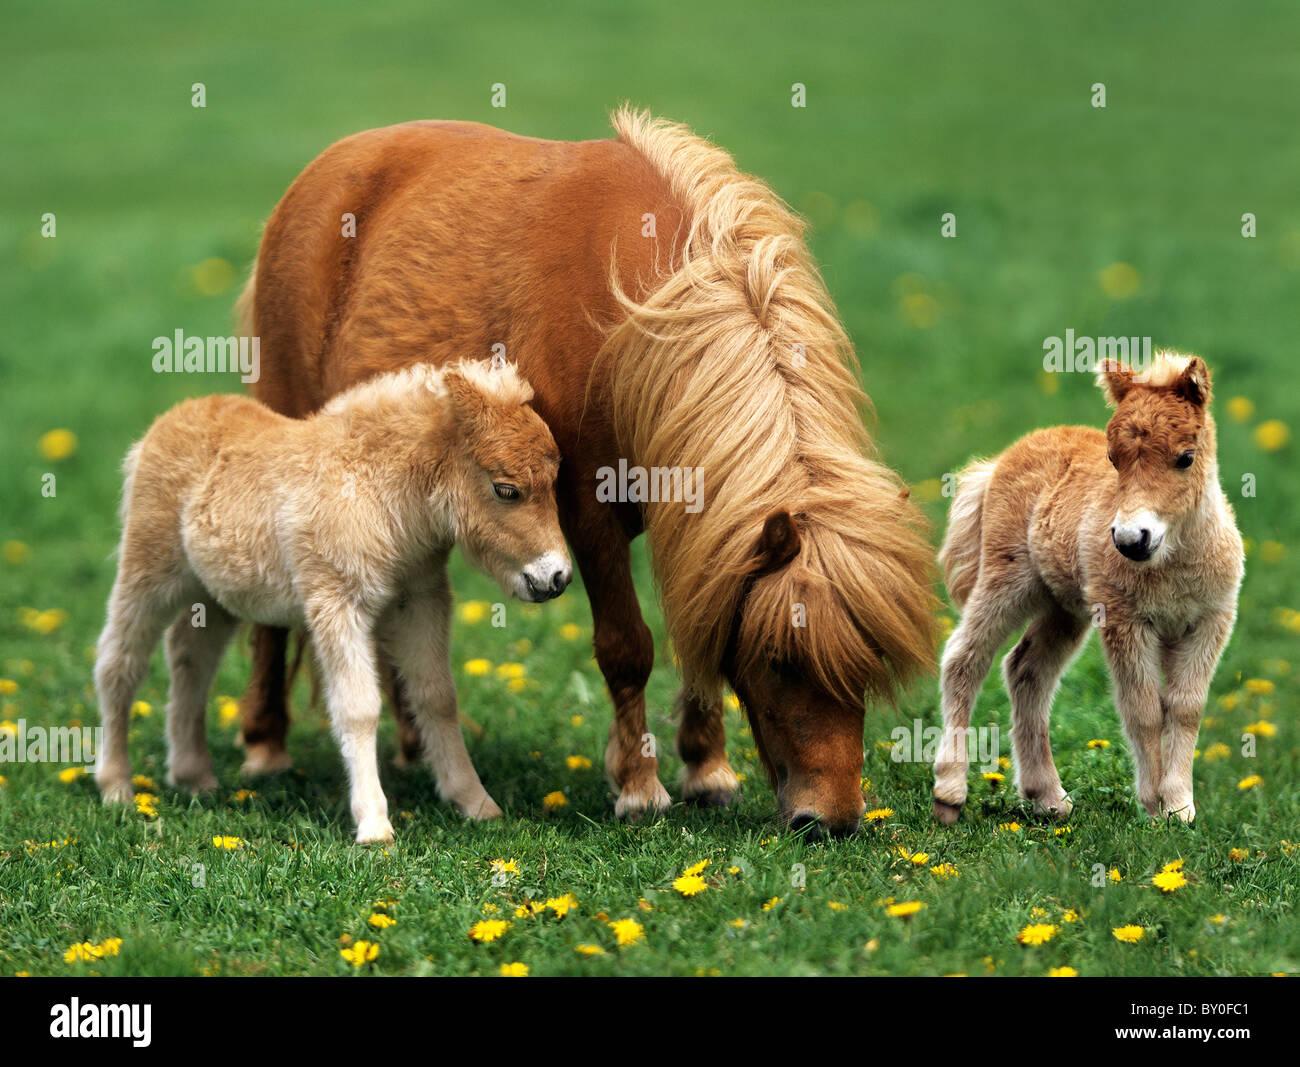 mini shetland pony stute mit fohlen twin auf wiese stockfoto bild 33818177 alamy. Black Bedroom Furniture Sets. Home Design Ideas